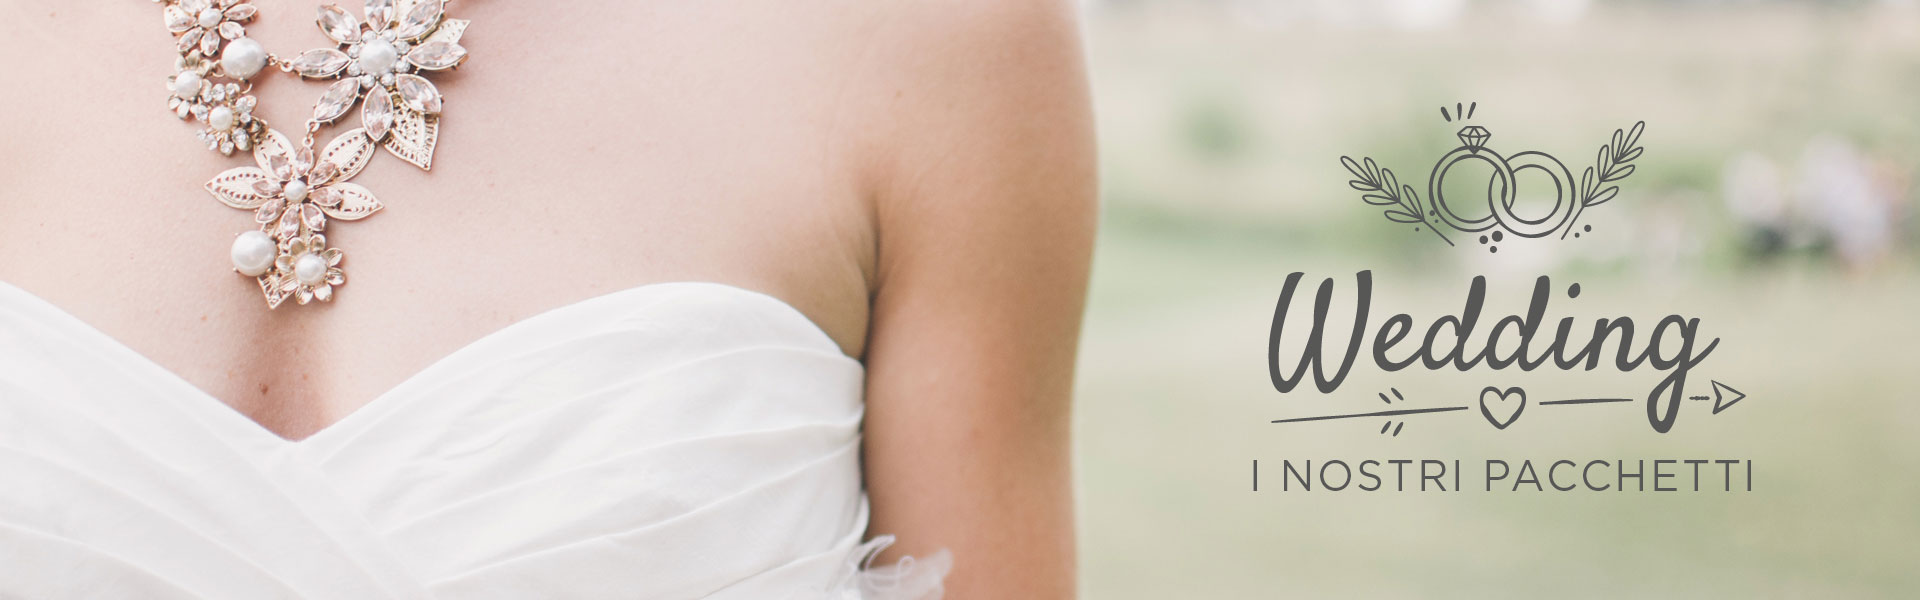 Maison Afrodite - Wedding - Pacchetti dedicati al matrimonio!